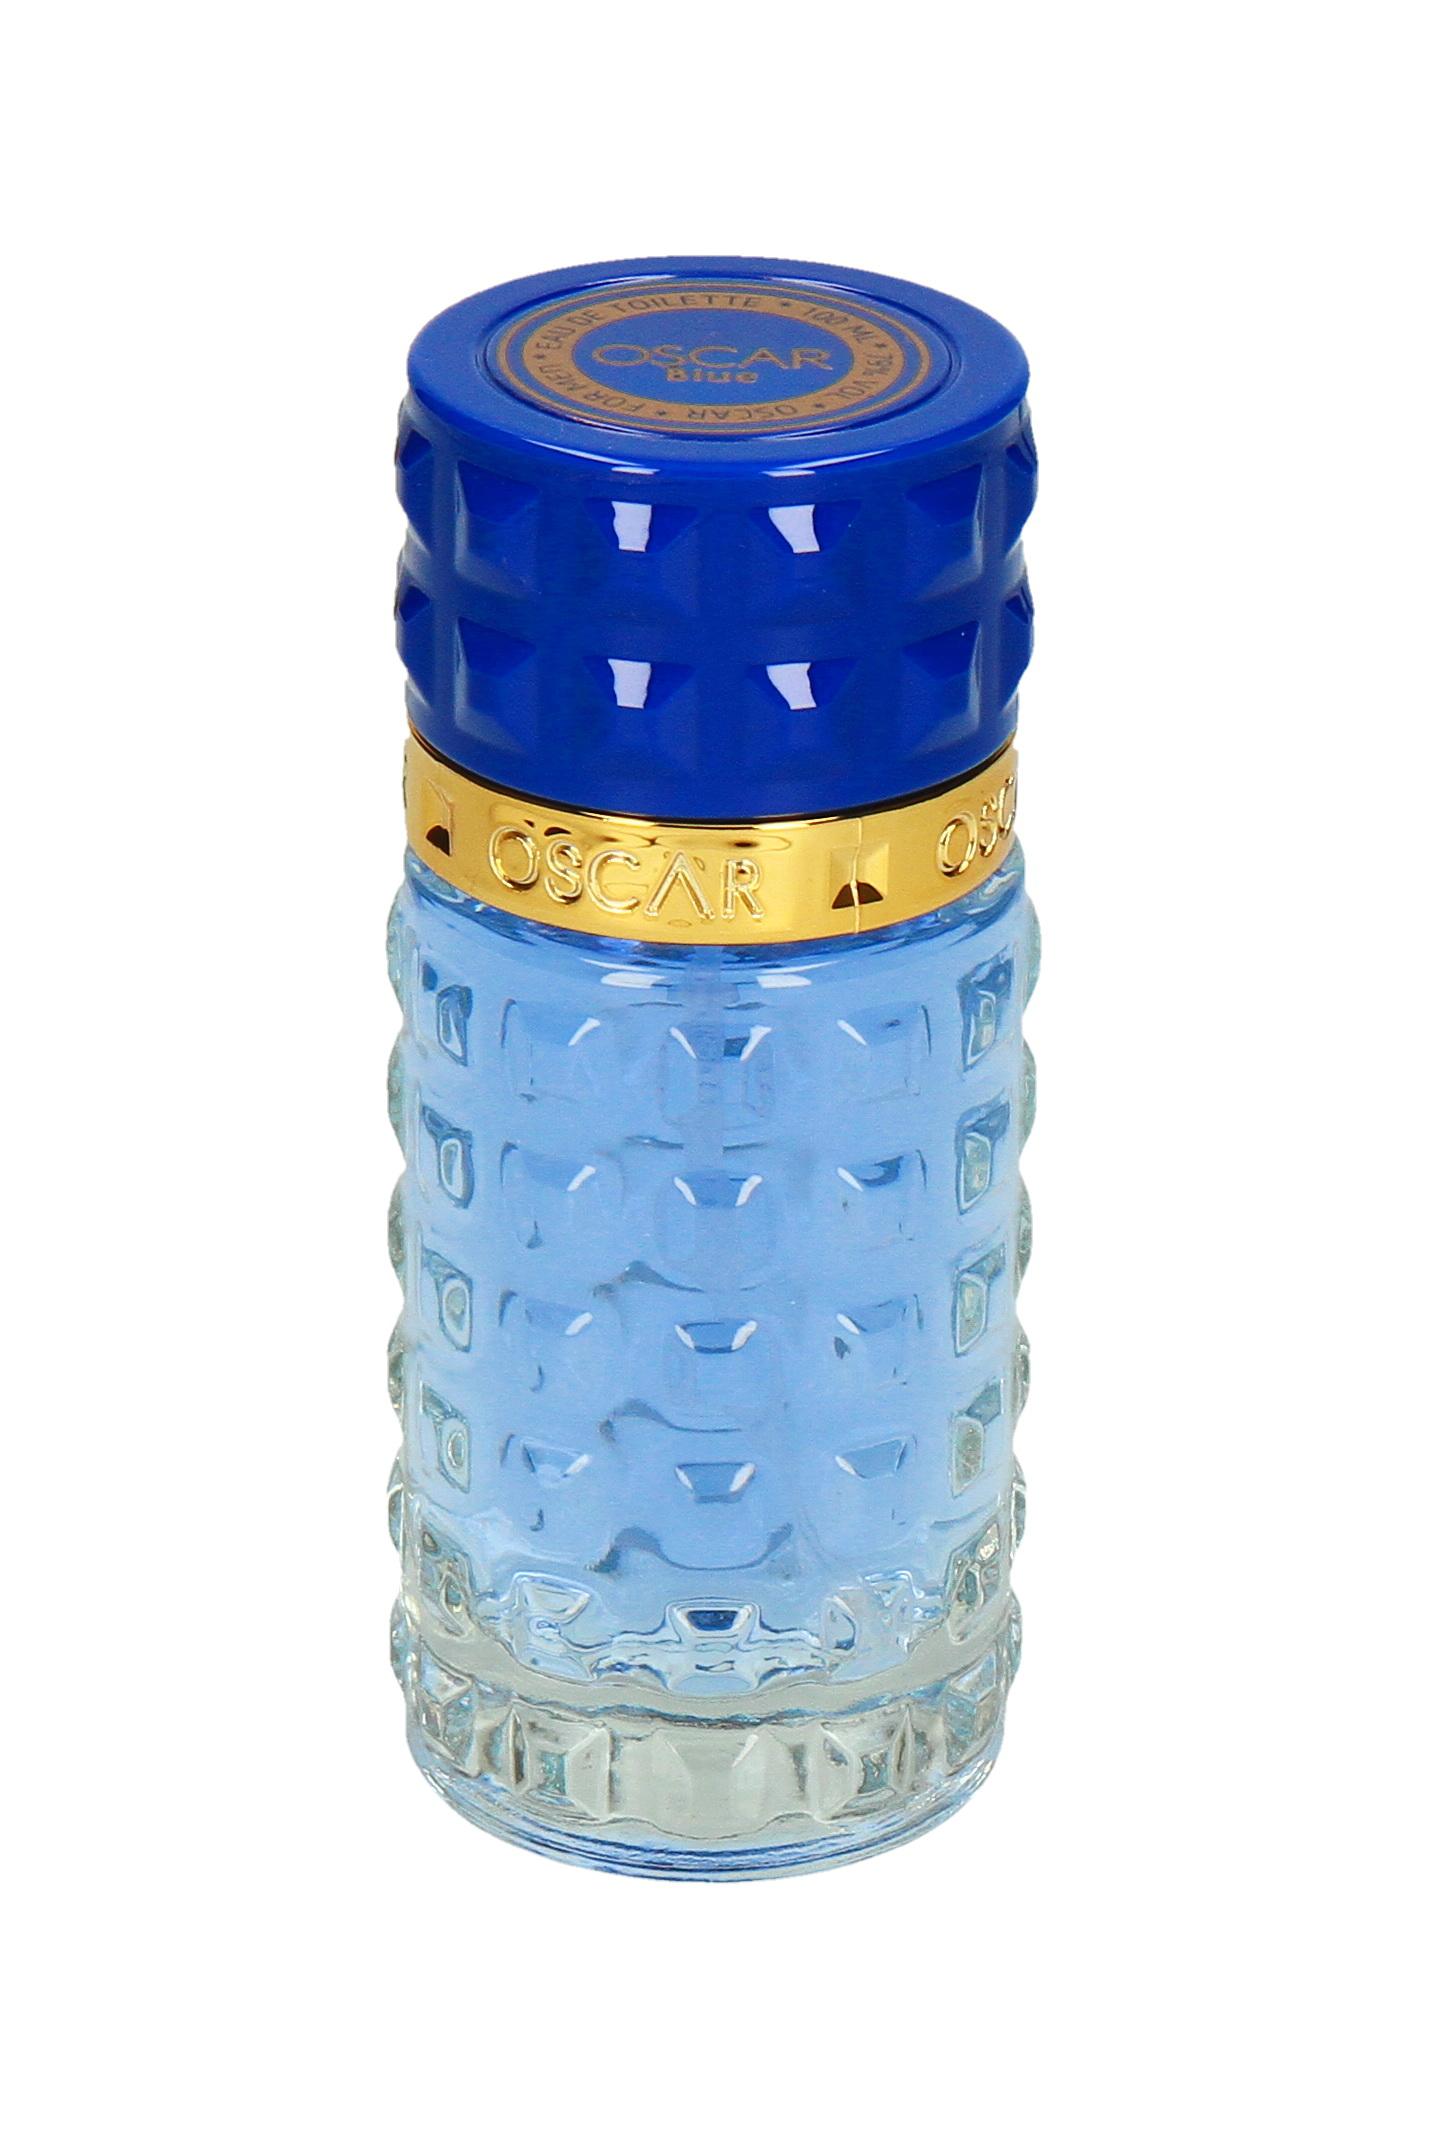 Туалетная вода для мужчин ПАРФЮМЕРИЯ XXI ВЕКА OSCAR Blue